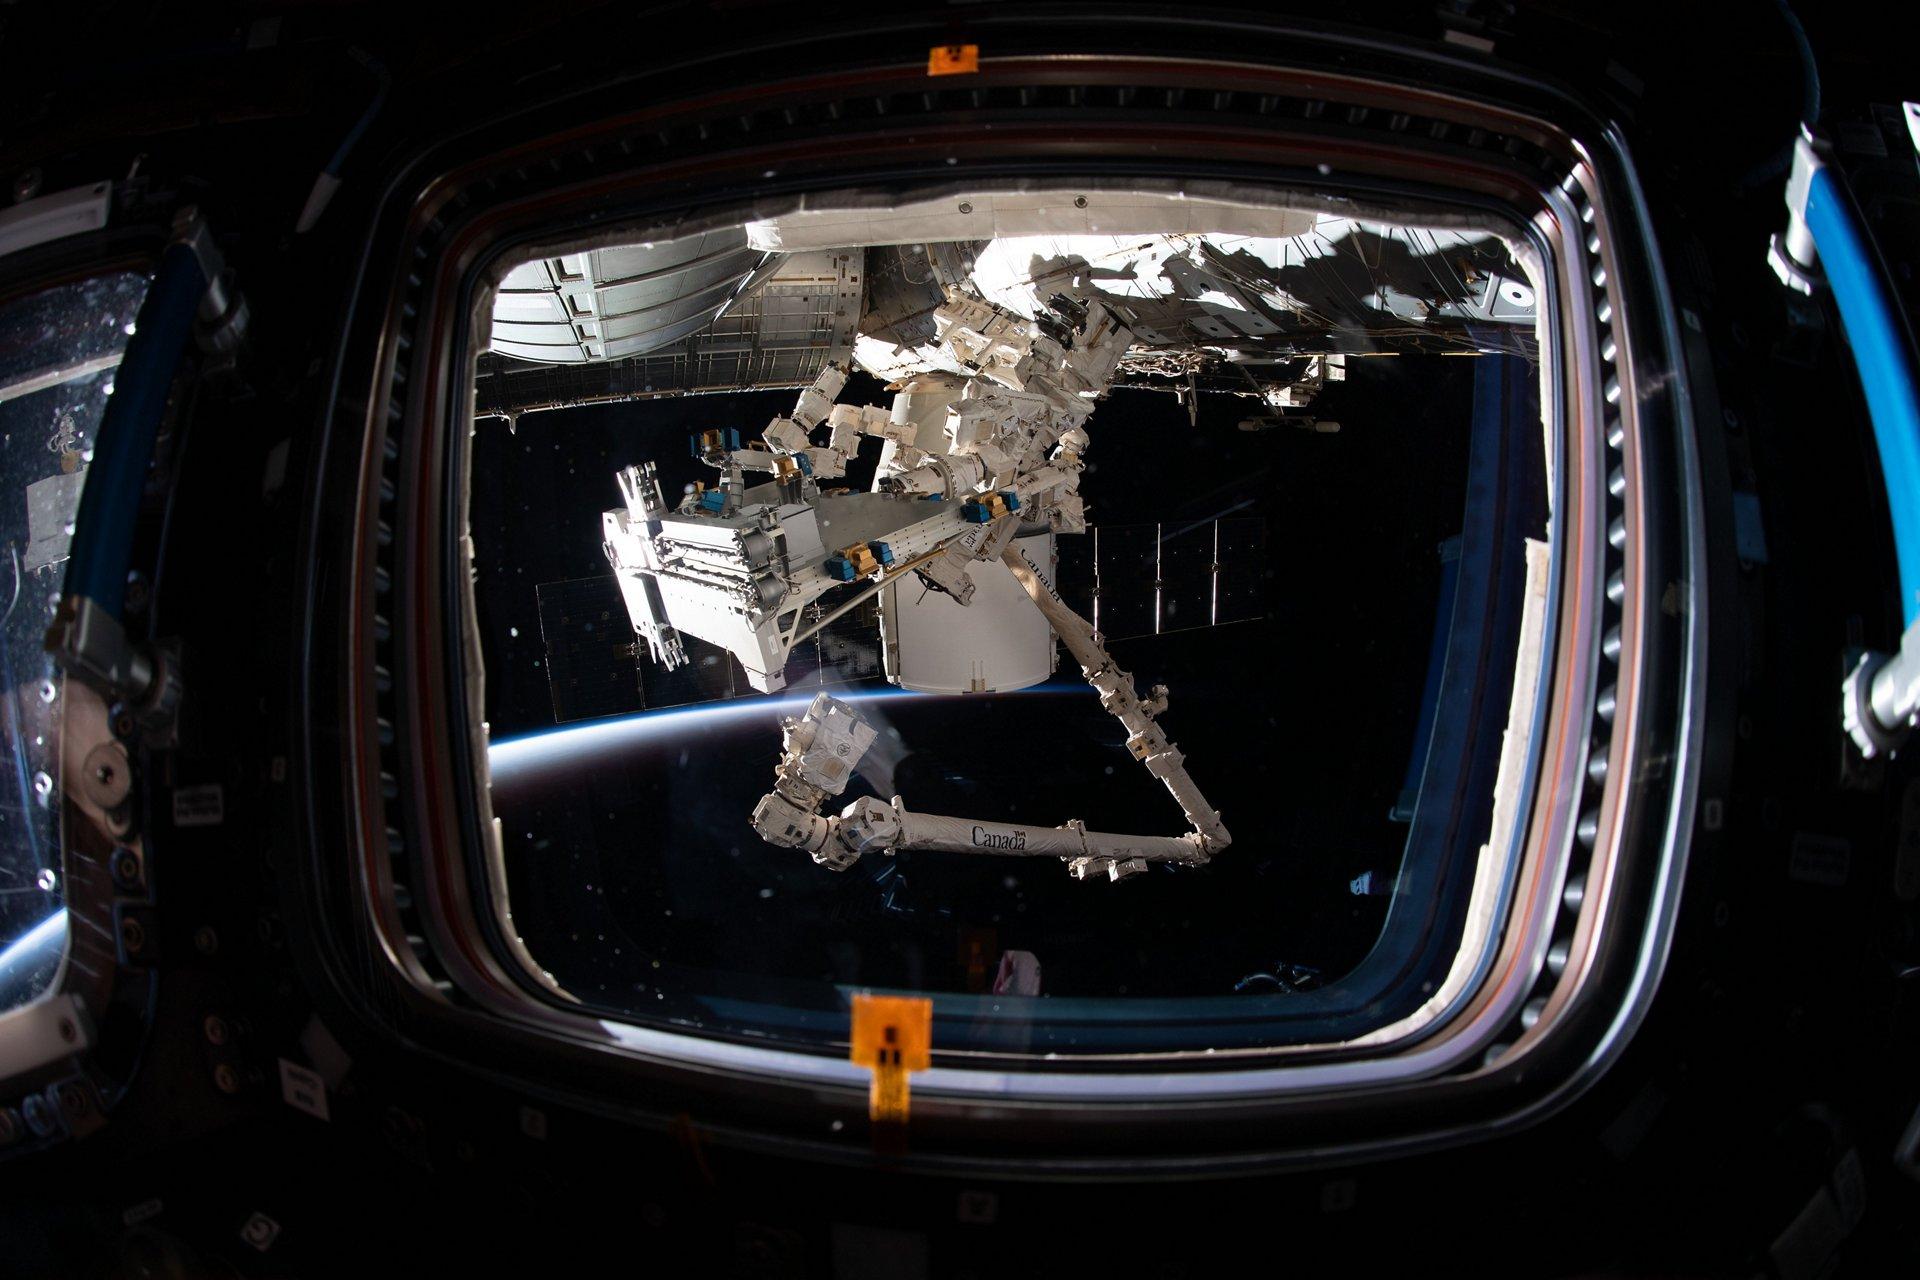 Bartolomeo in the parking position below the Destiny module (©NASA)